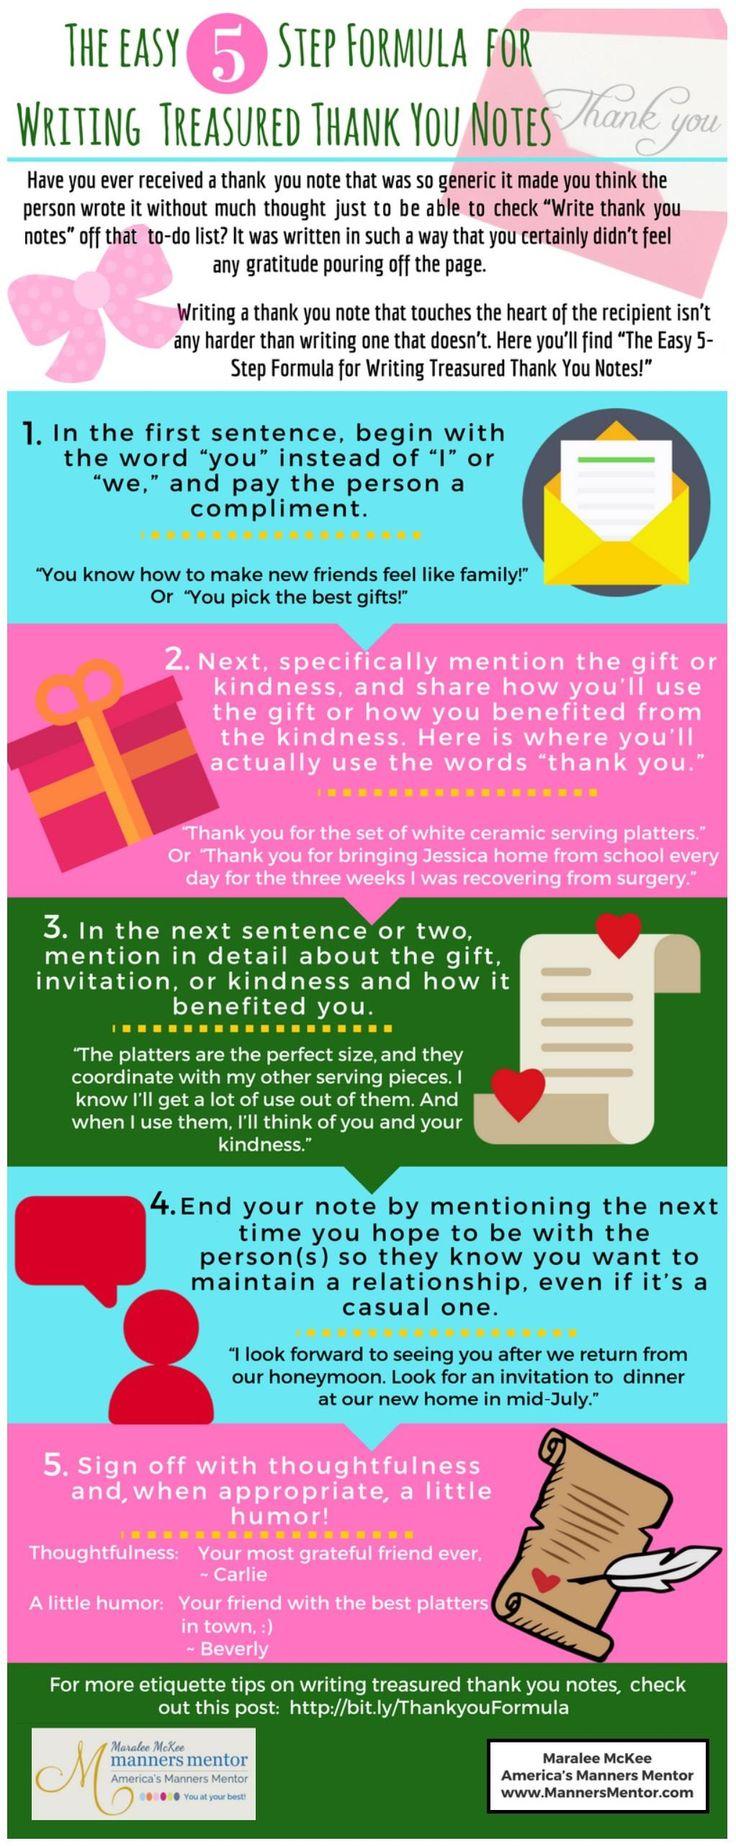 81 best Everyday Etiquette images on Pinterest | Manners, Etiquette ...